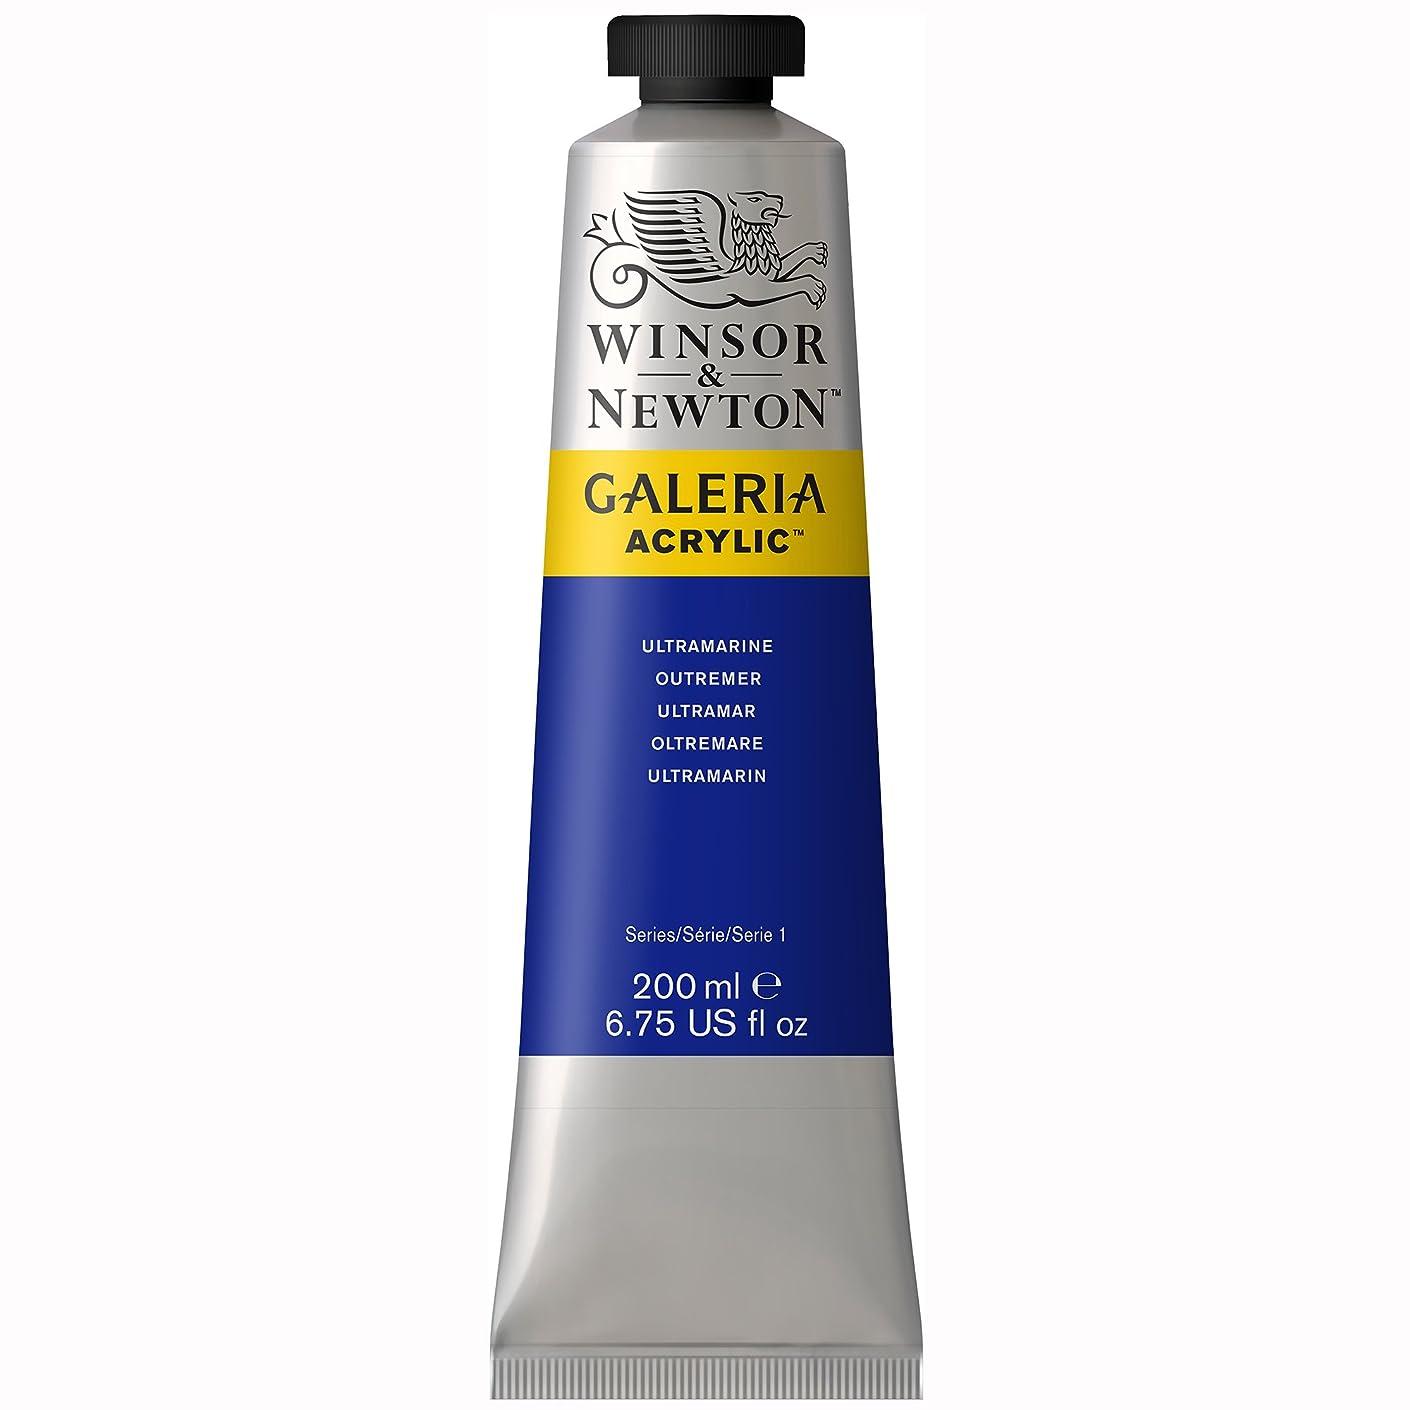 Winsor & Newton Galeria Acrylic Paint, 200ml Tube, Ultramarine